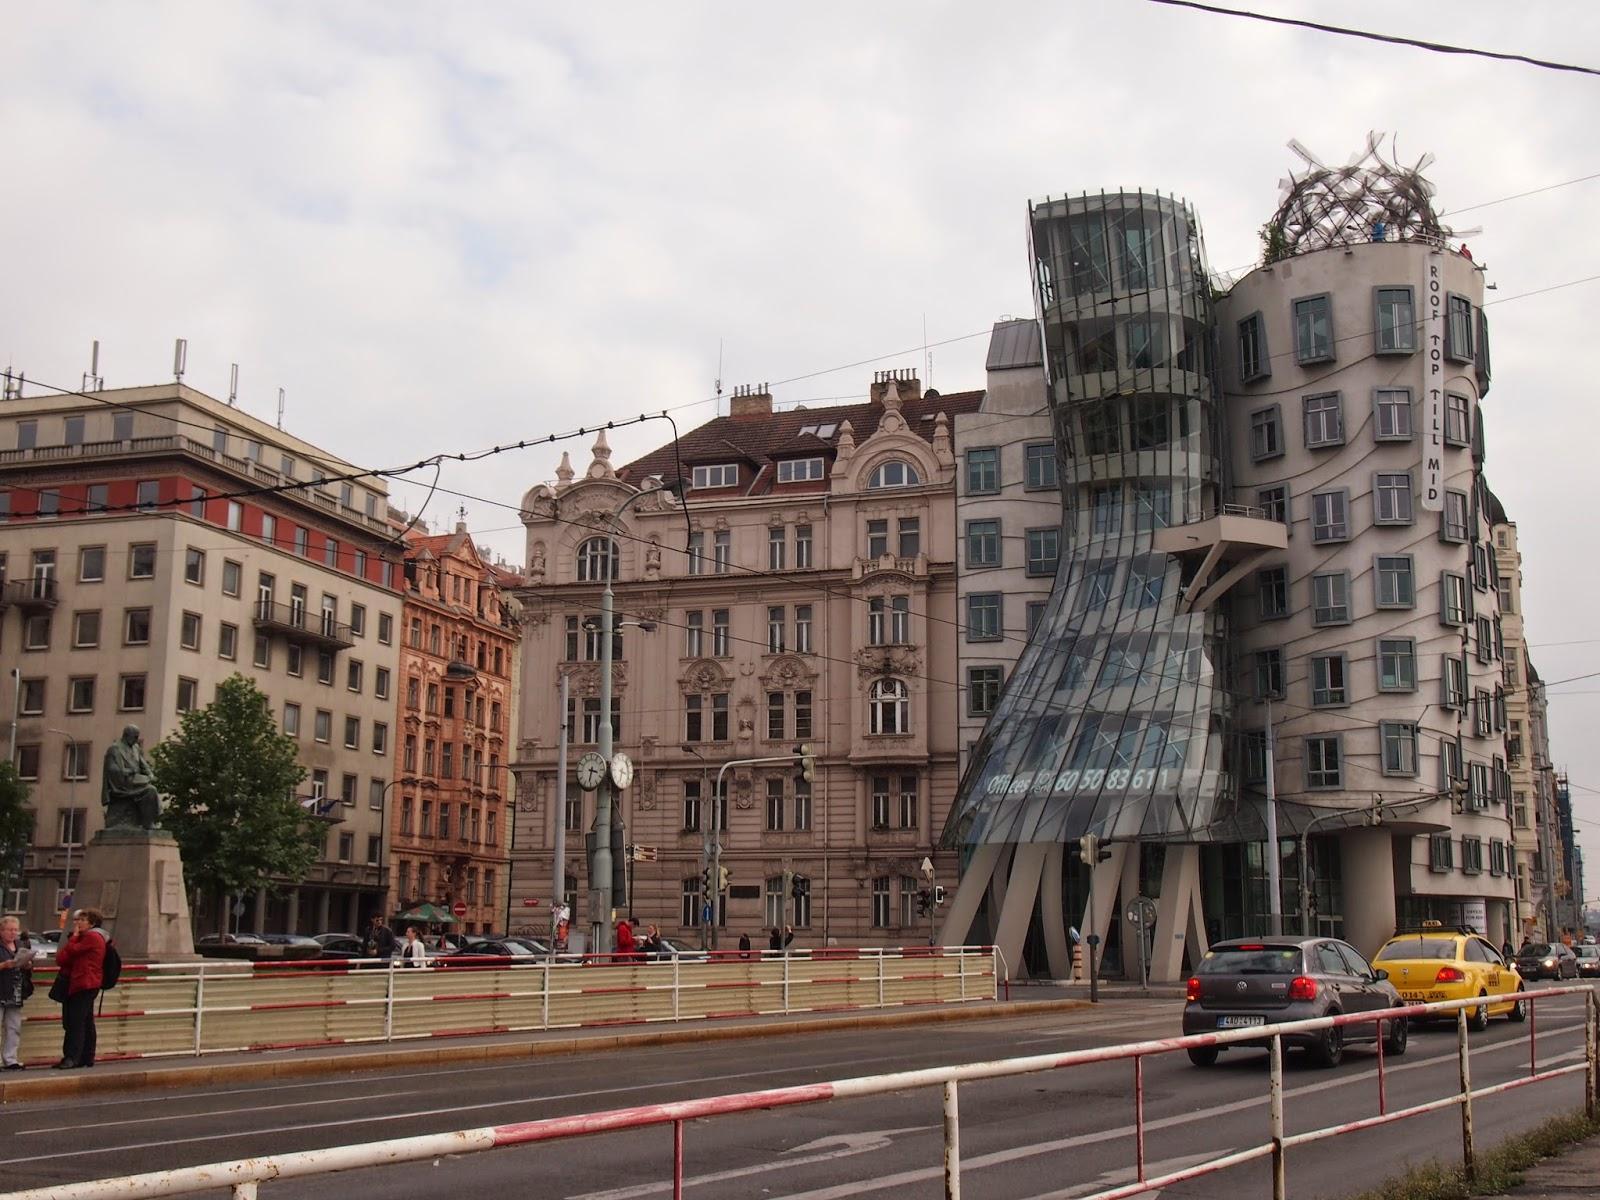 The Dancing Building